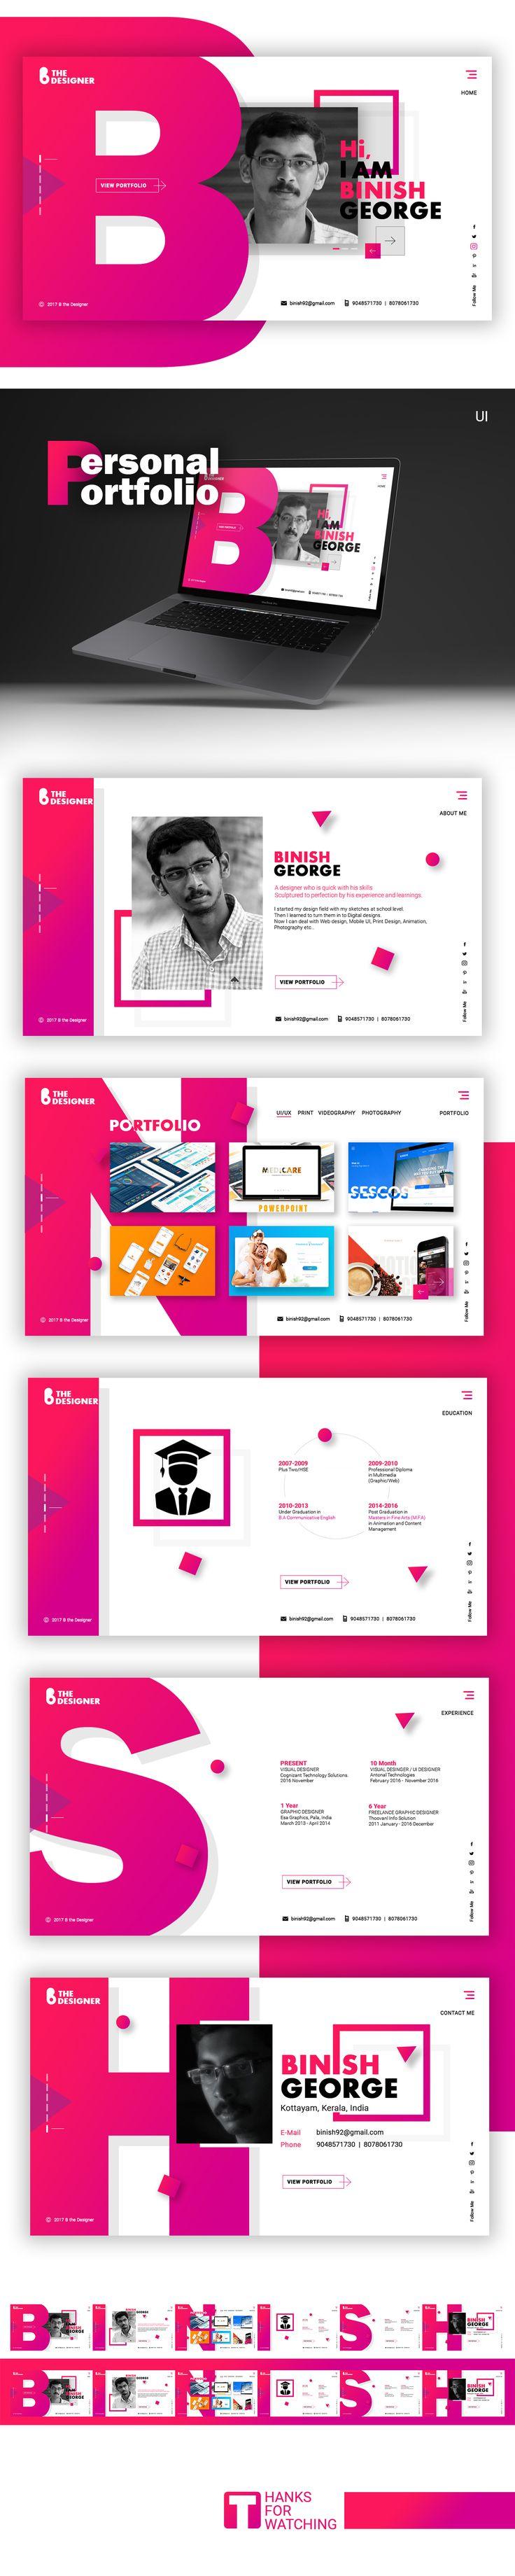 My Web Portfolio Design